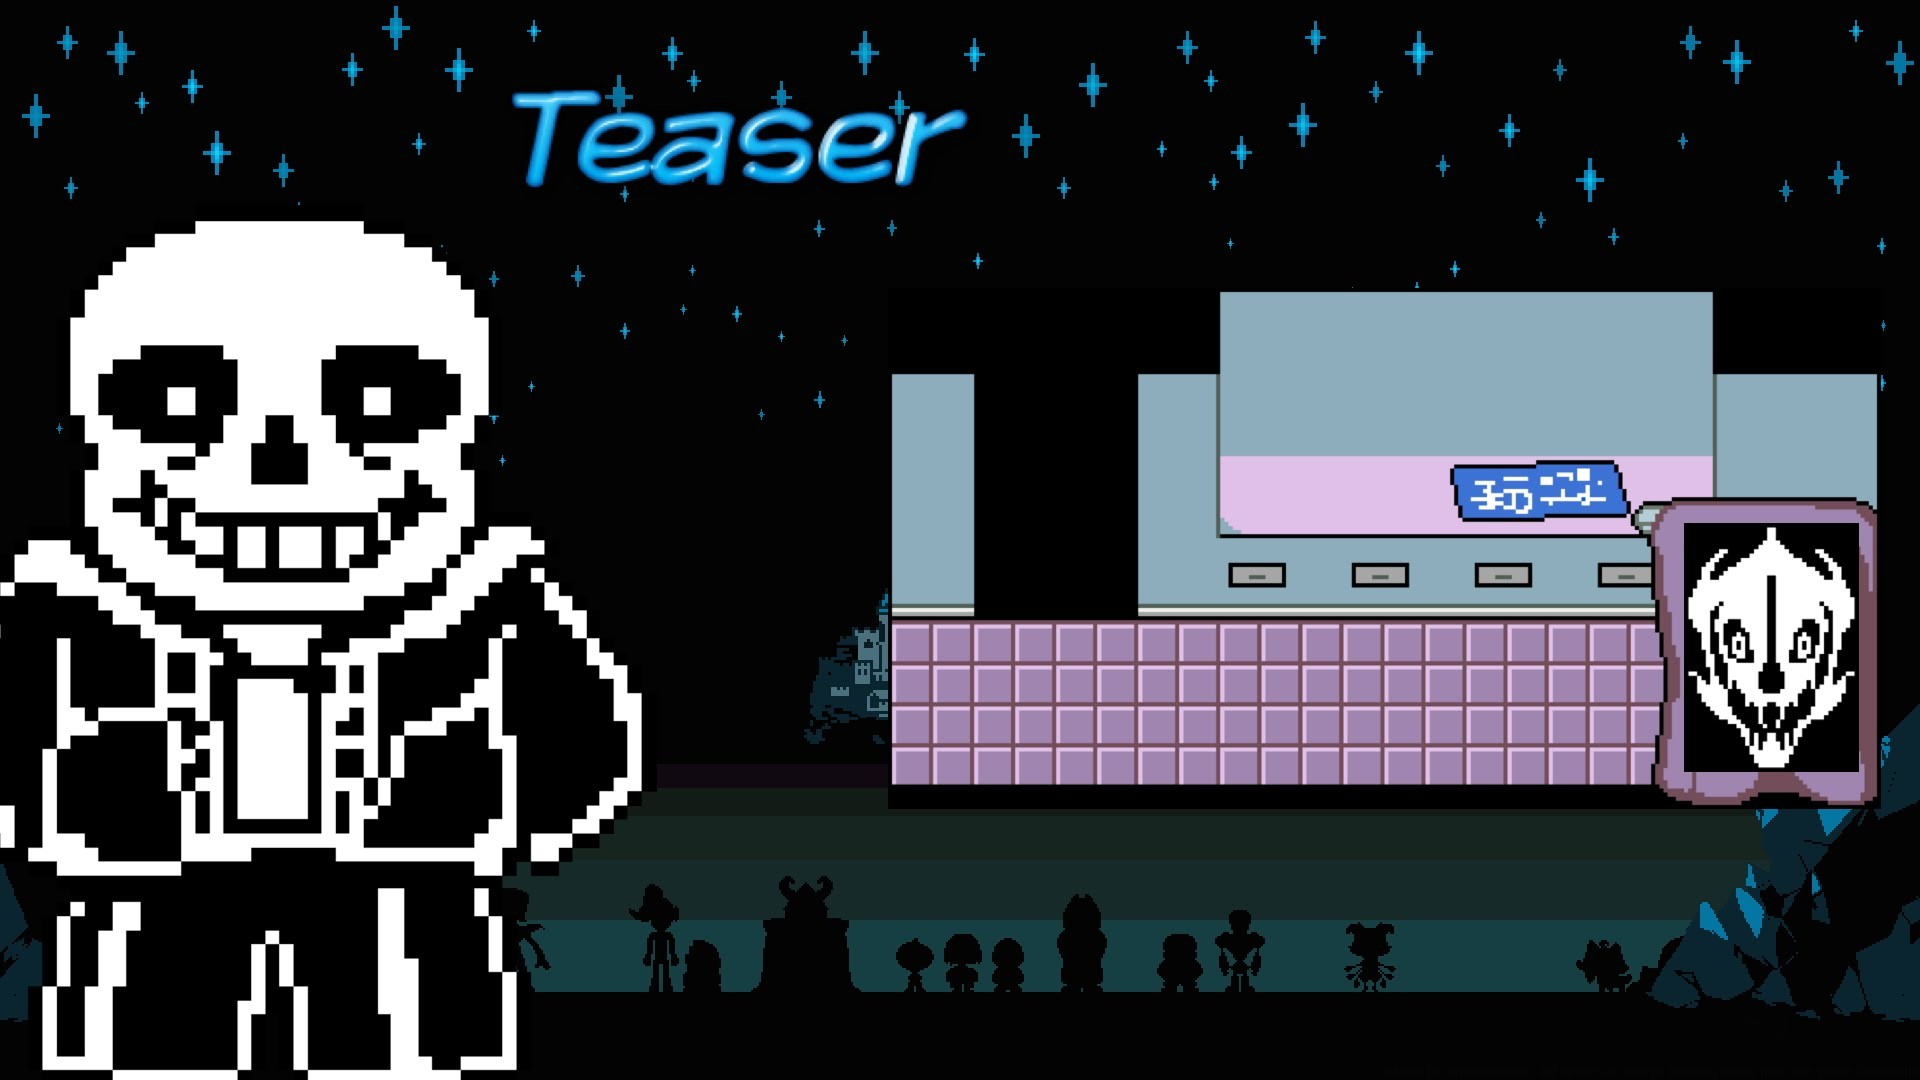 【Teaser】Sans' Workshop Secrets Gaster Blaster Prototype?! [Undertale Theory]